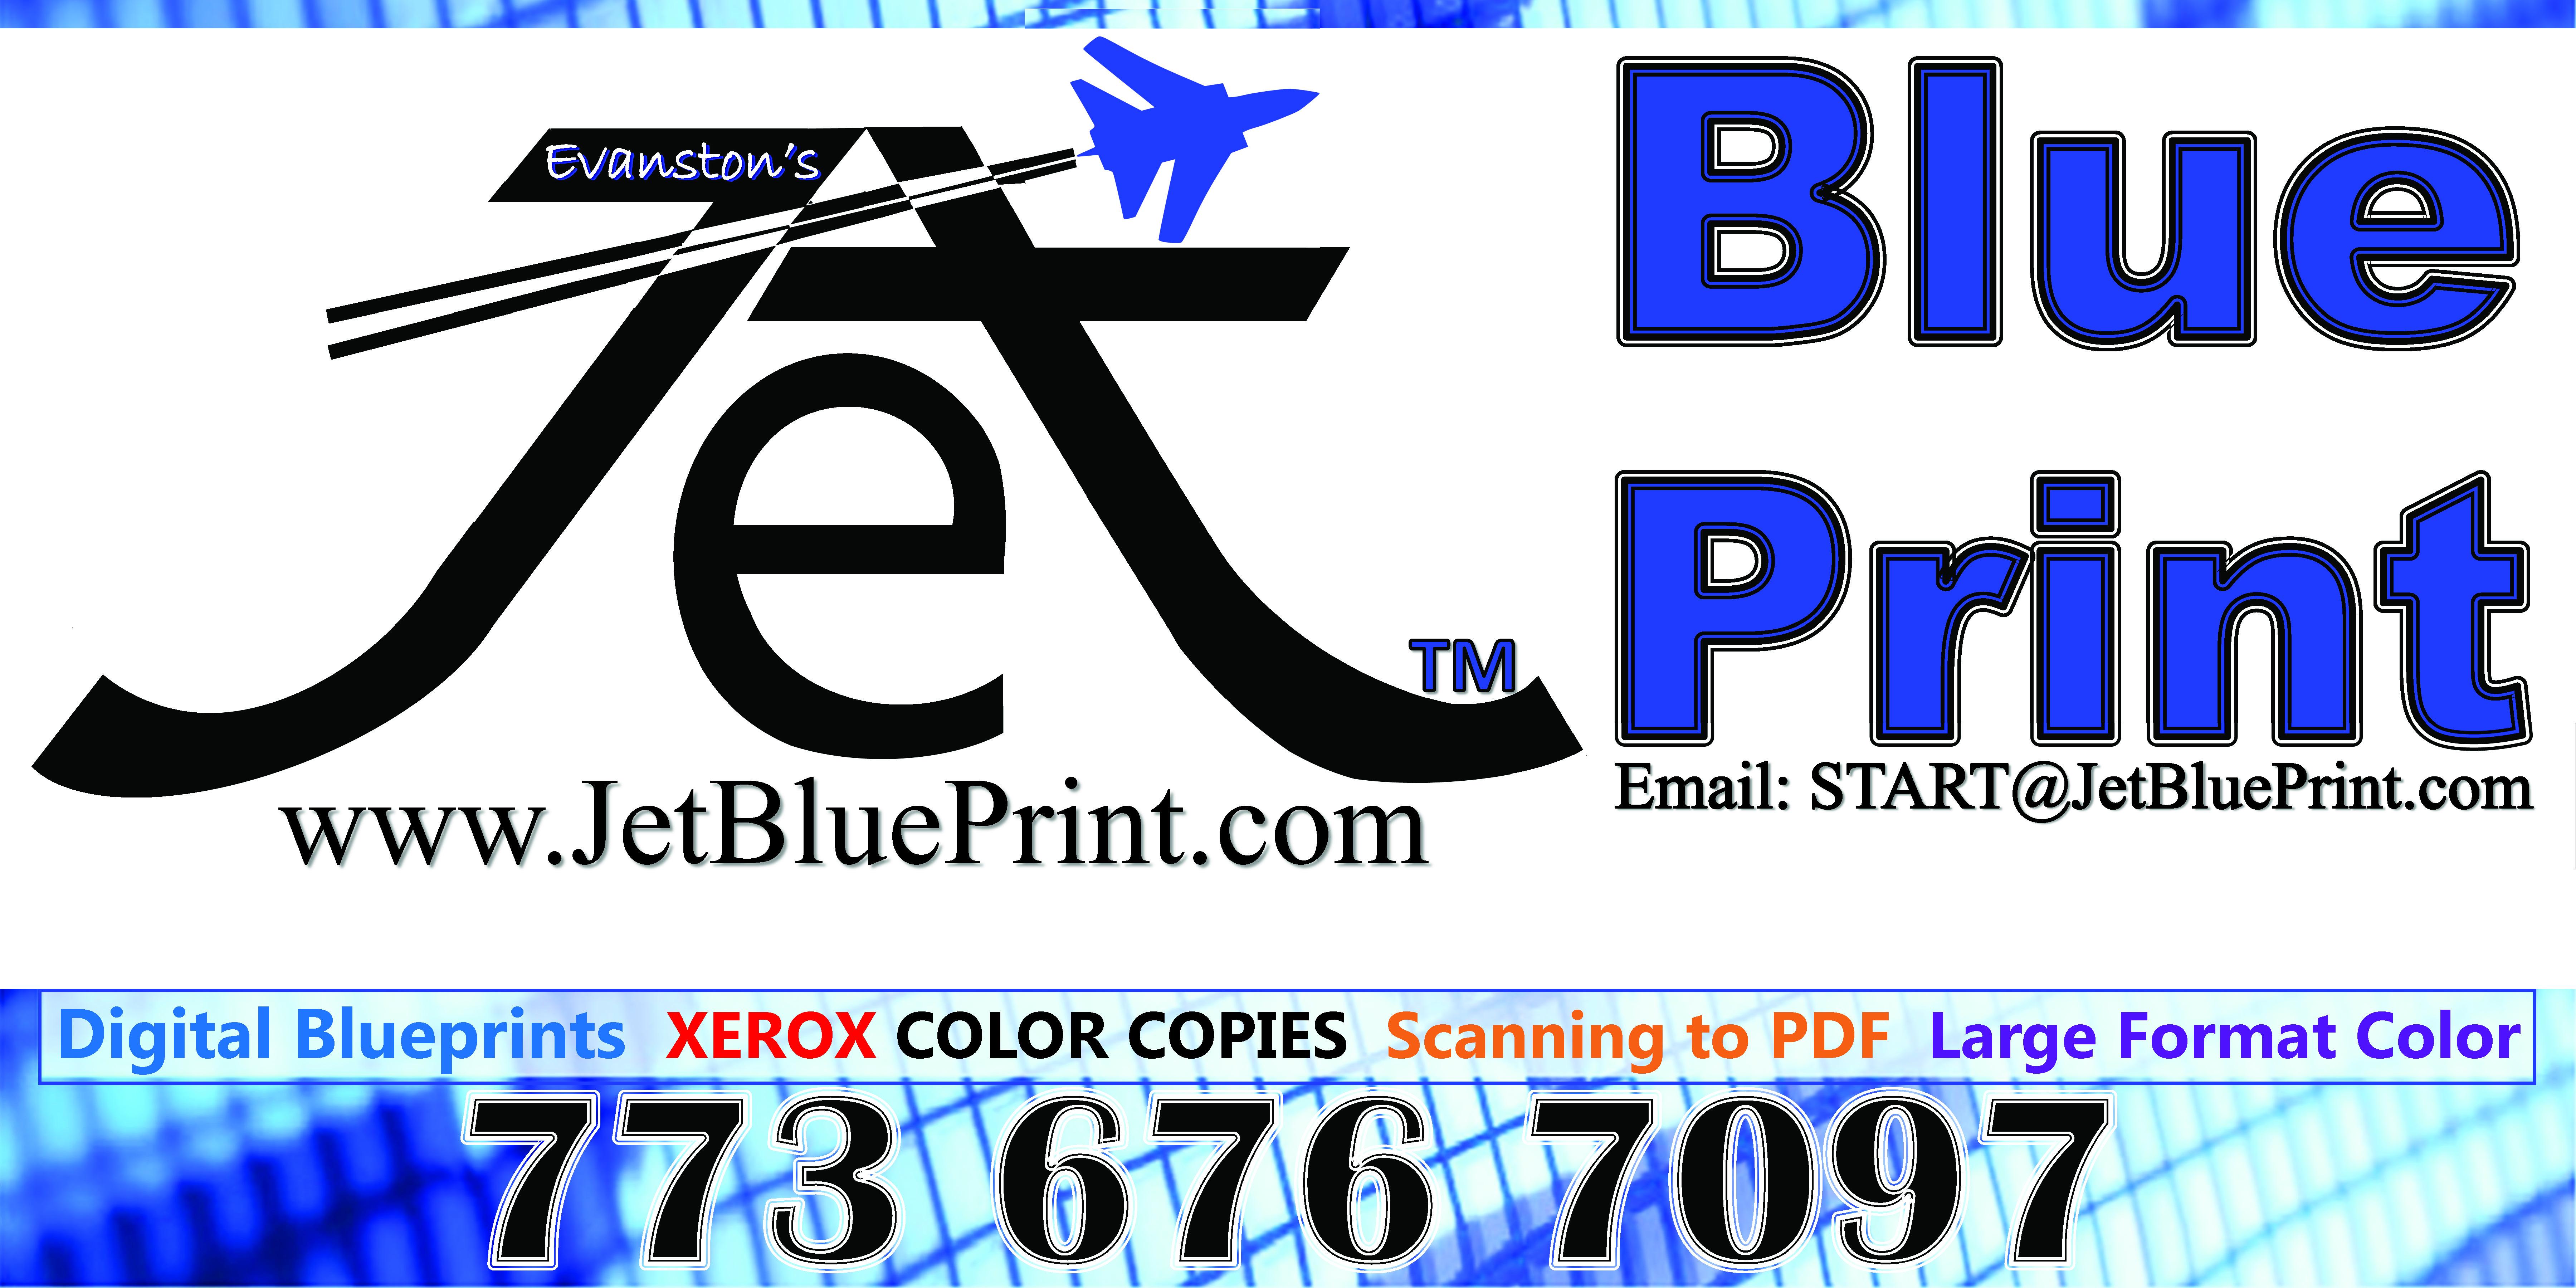 Jet Blue Print Home